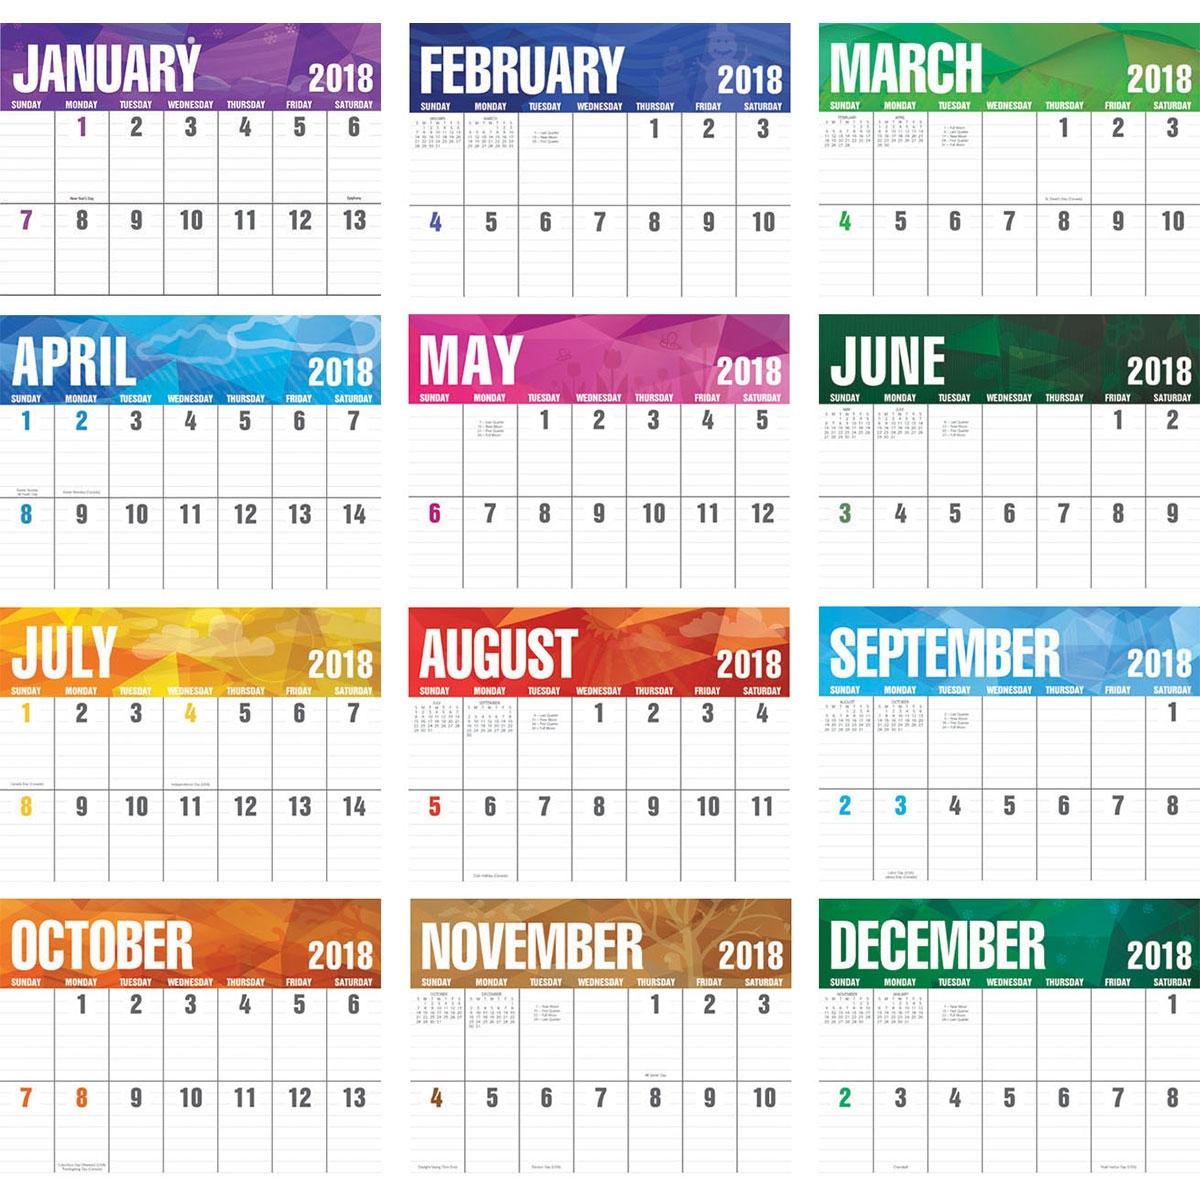 2018 Big Block Calendar 2018 Imprinted Calendars 2018 Calendar 89uj